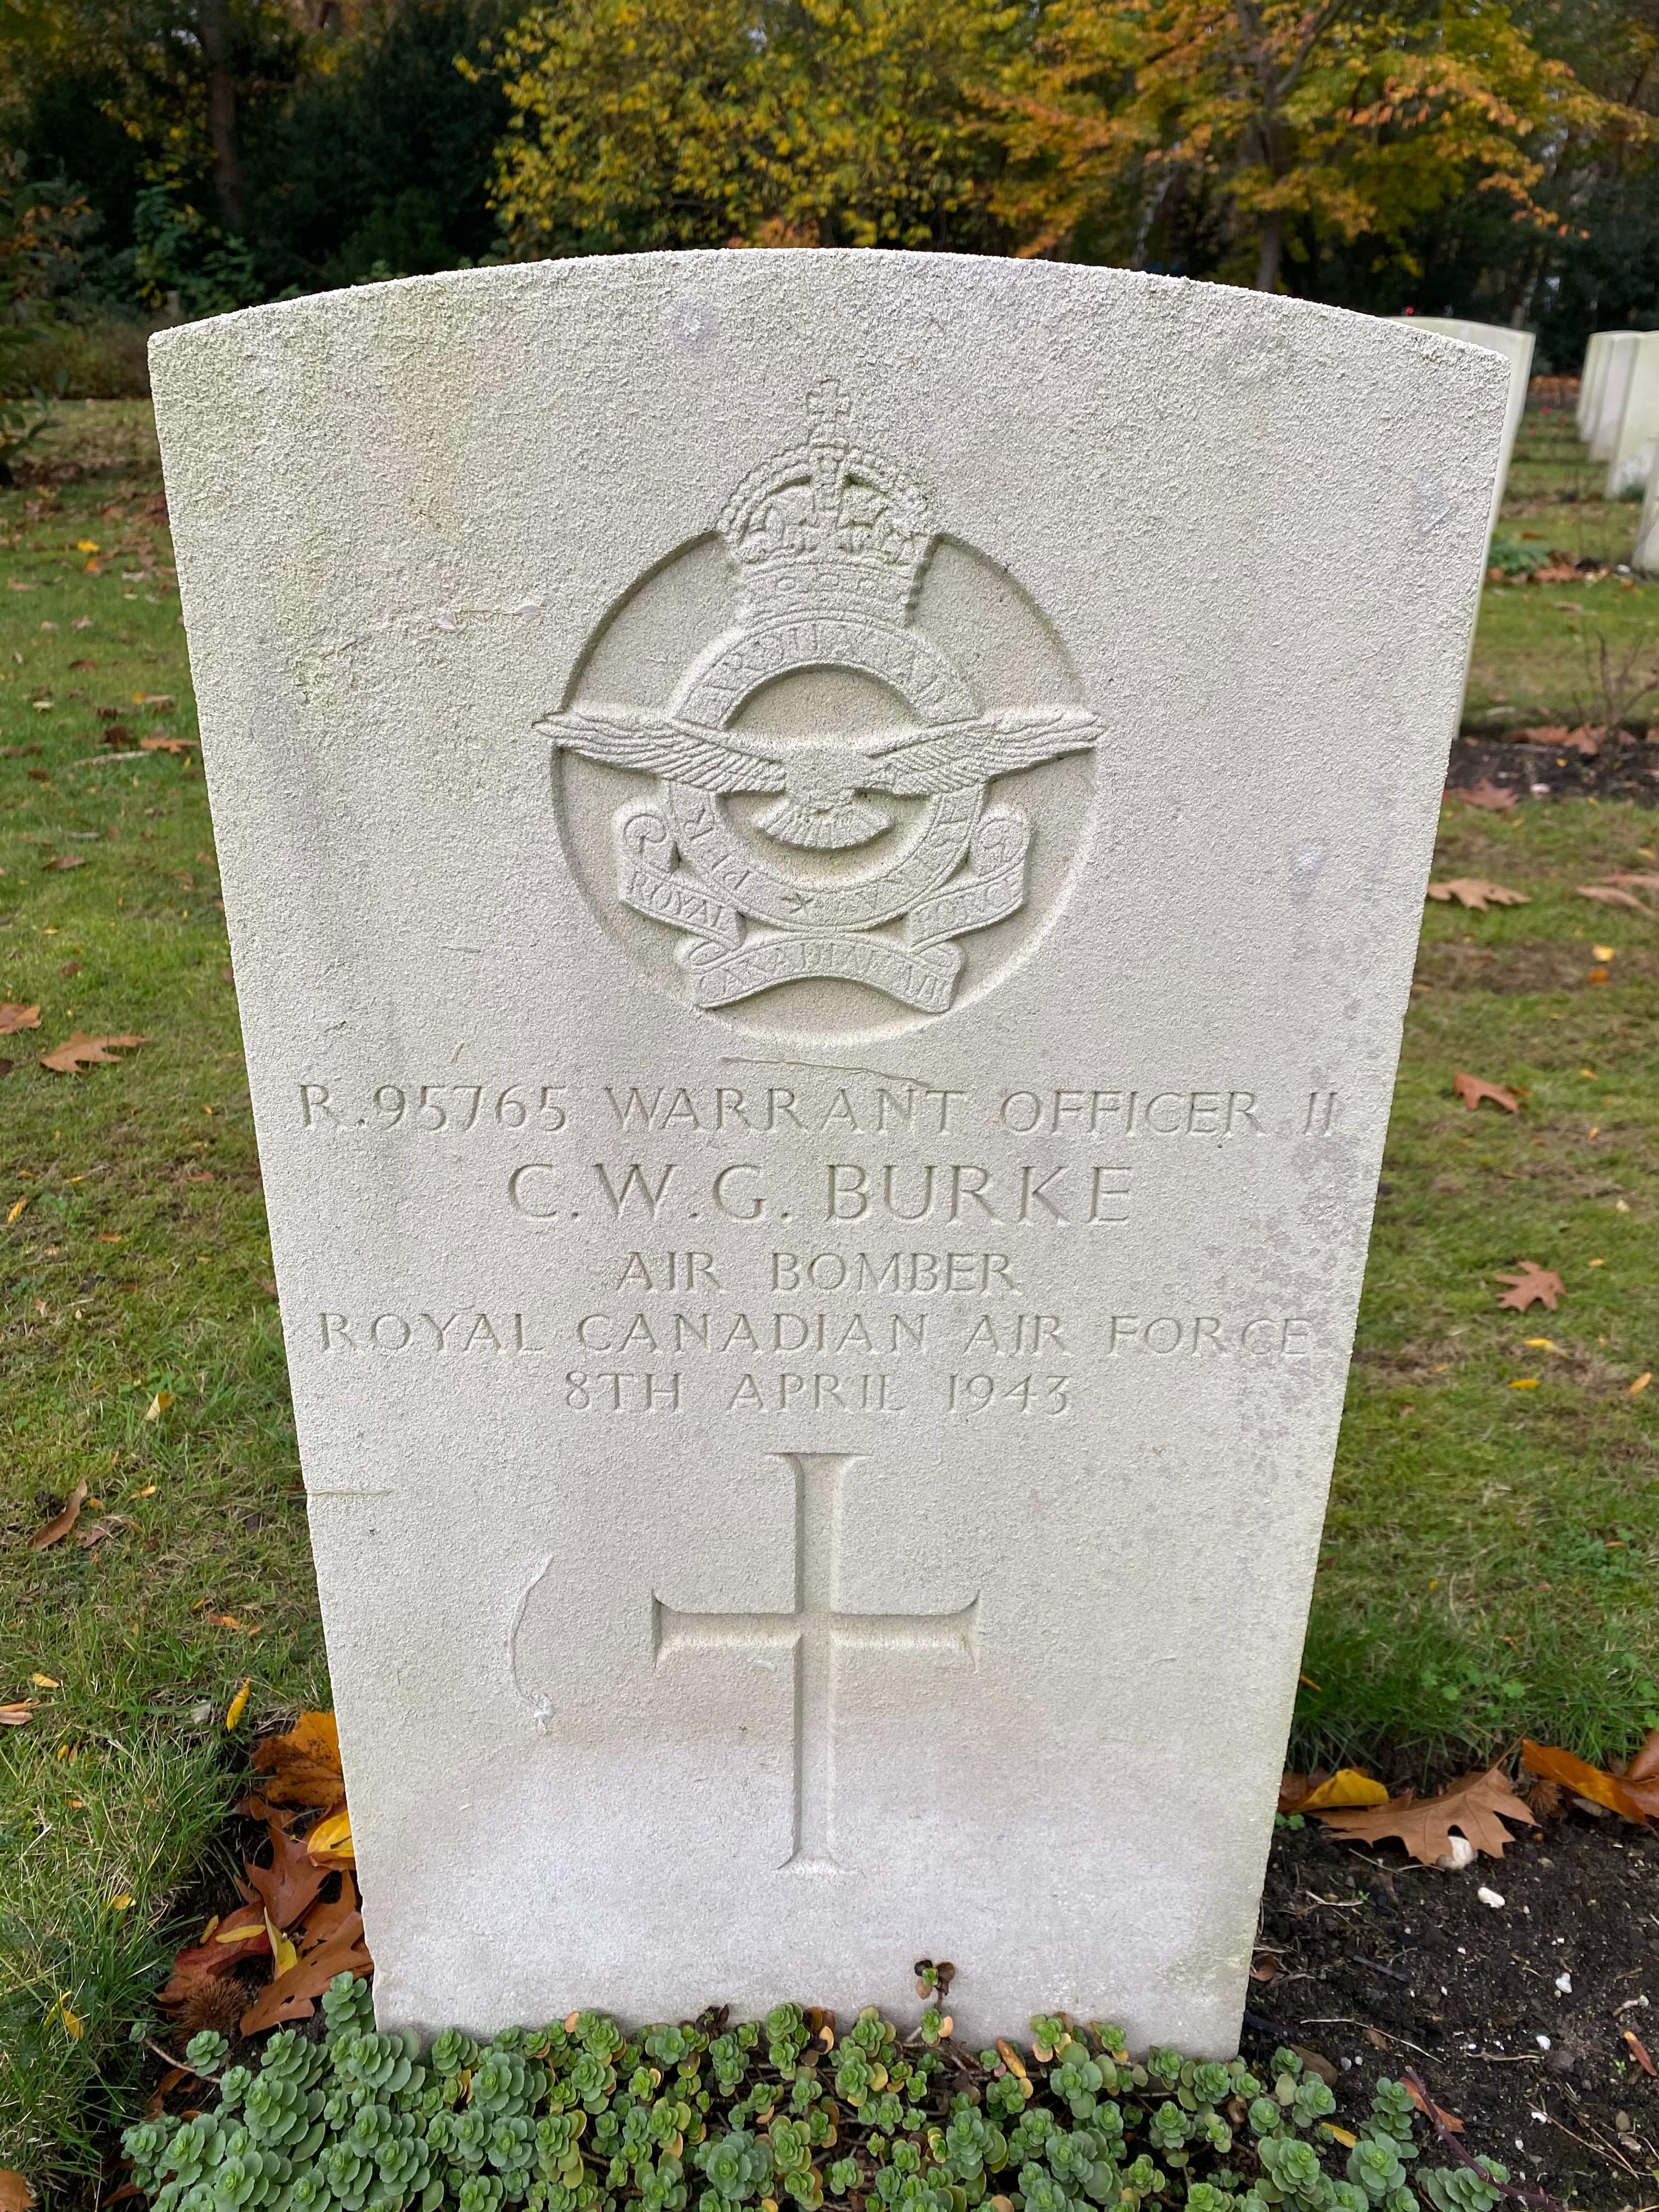 Grave marker– Grave marker from Cuthbert Burke's grave at Jonkerbos War Cemetery, Nijmegen, The Netherlands.  Cuthbert Burke was born in Panama City on 16 December 1913.